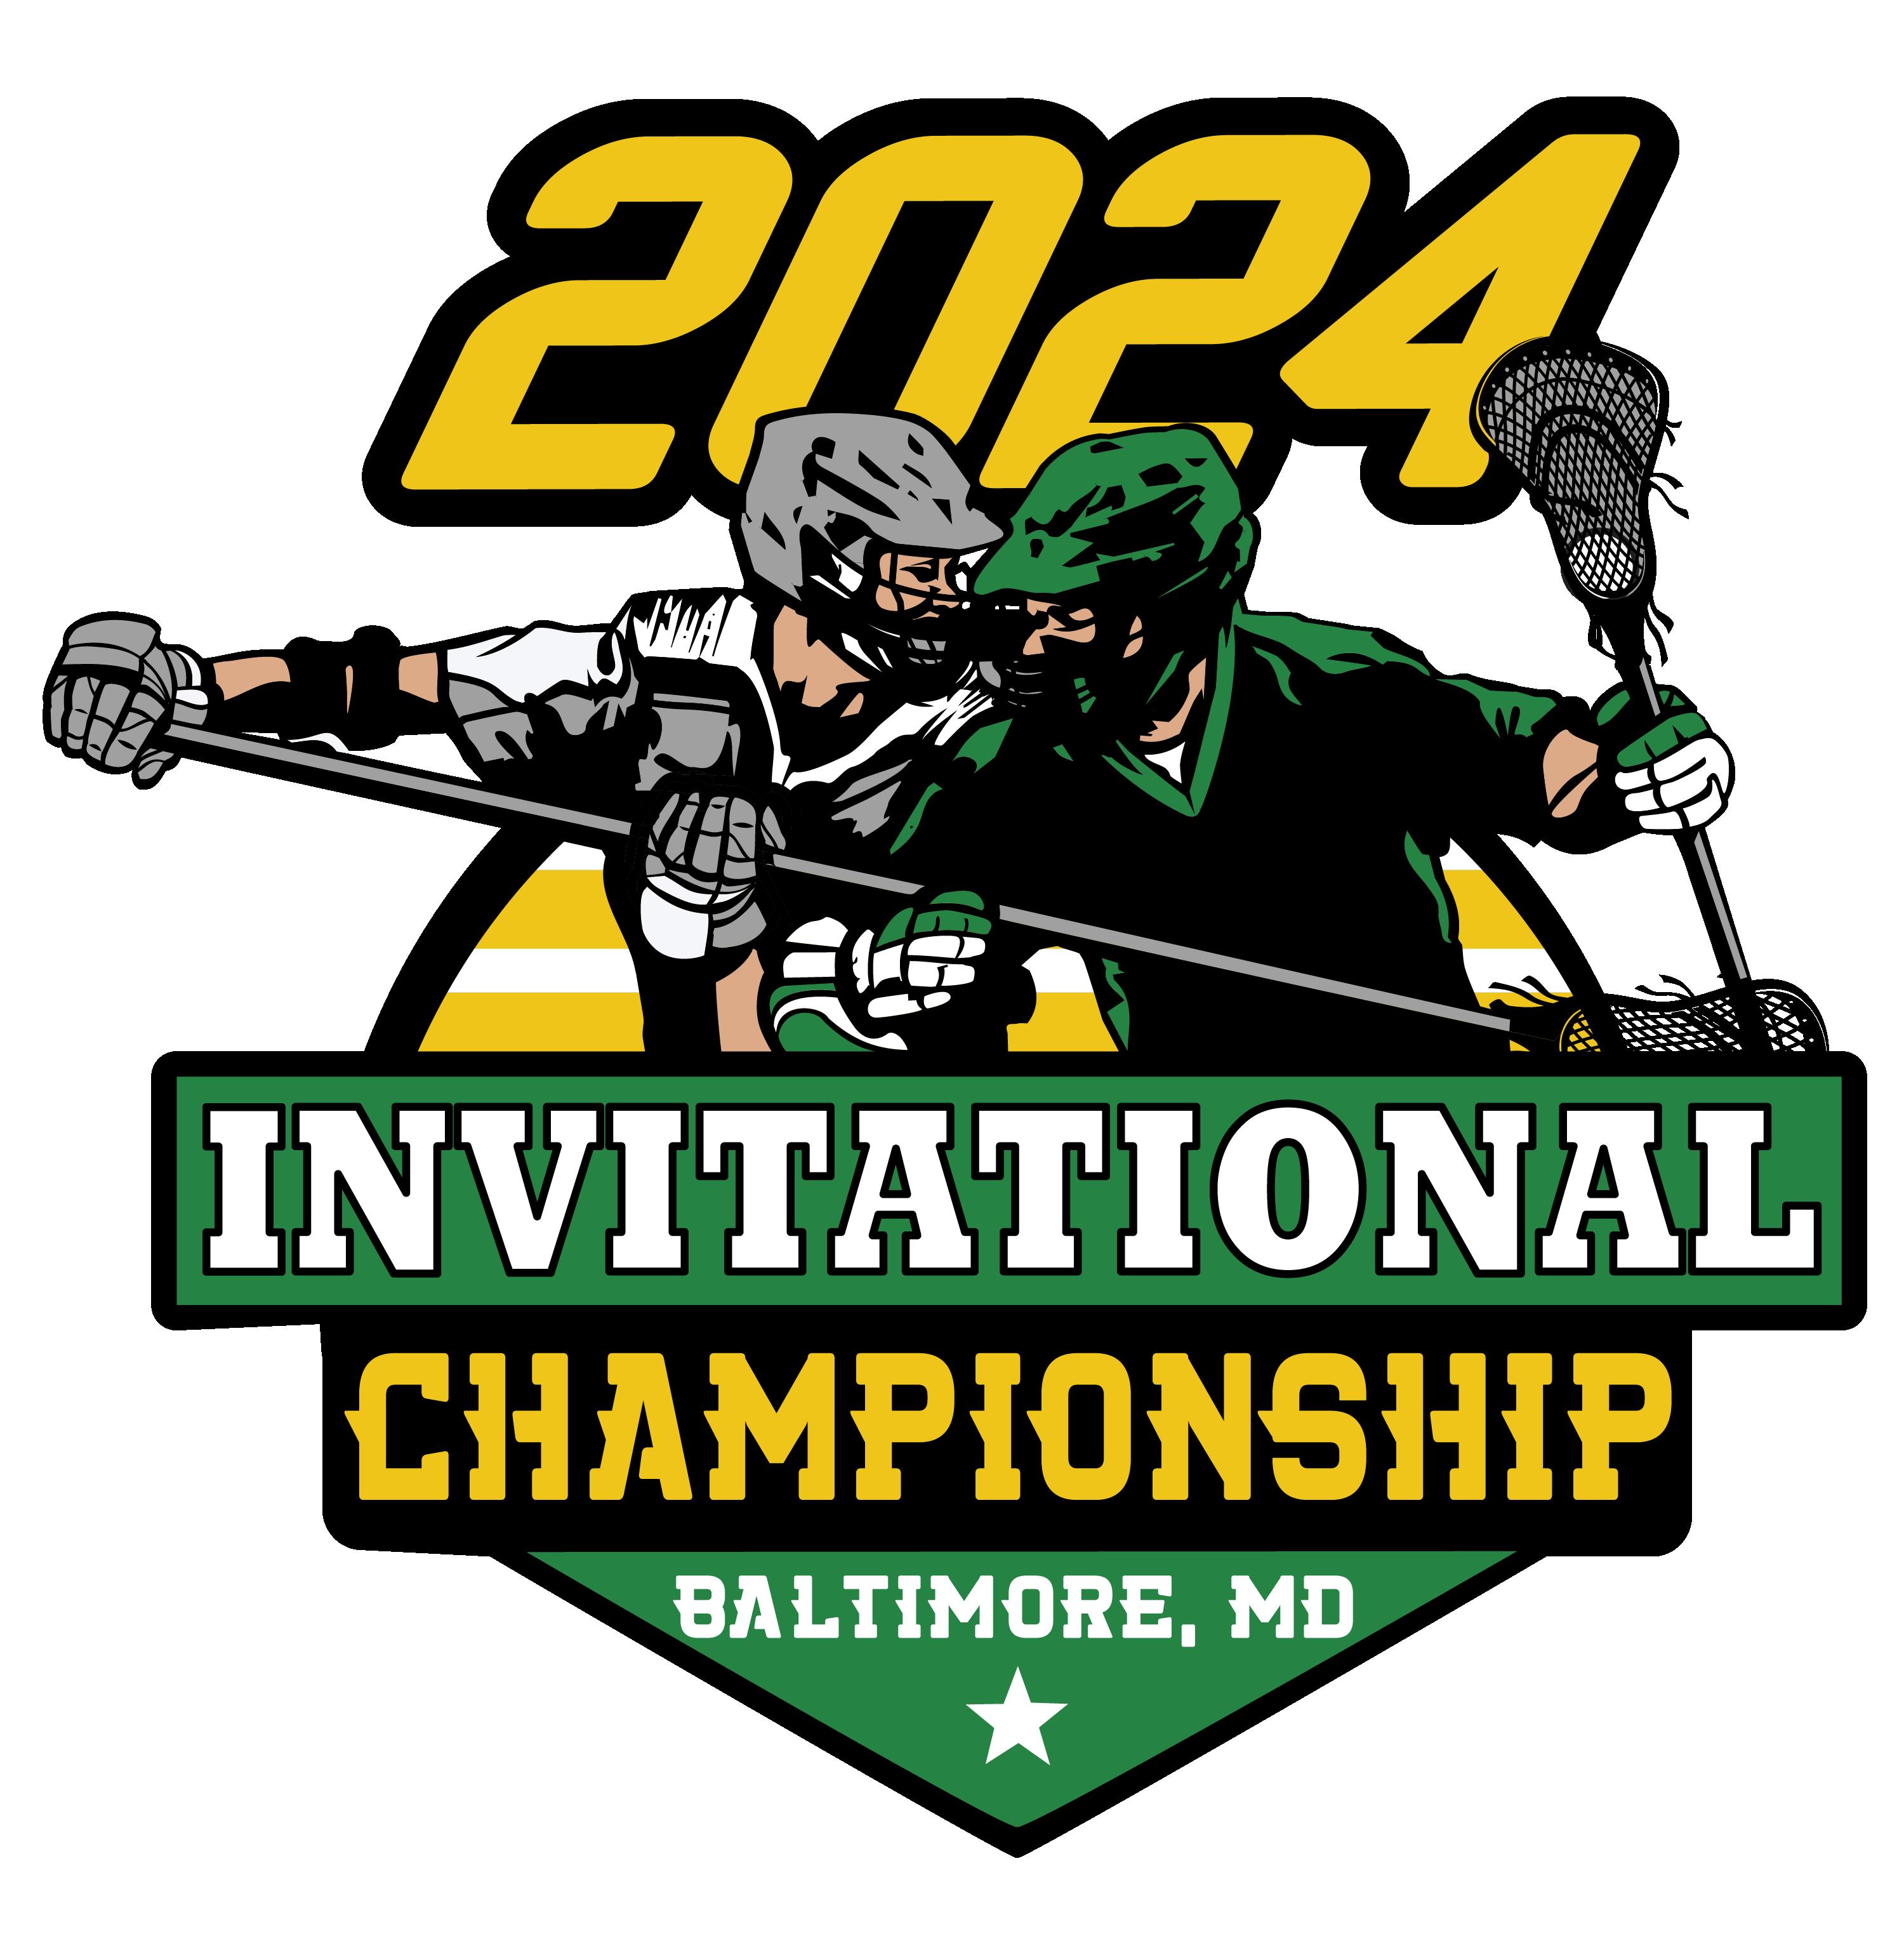 2024 Invitational Championship